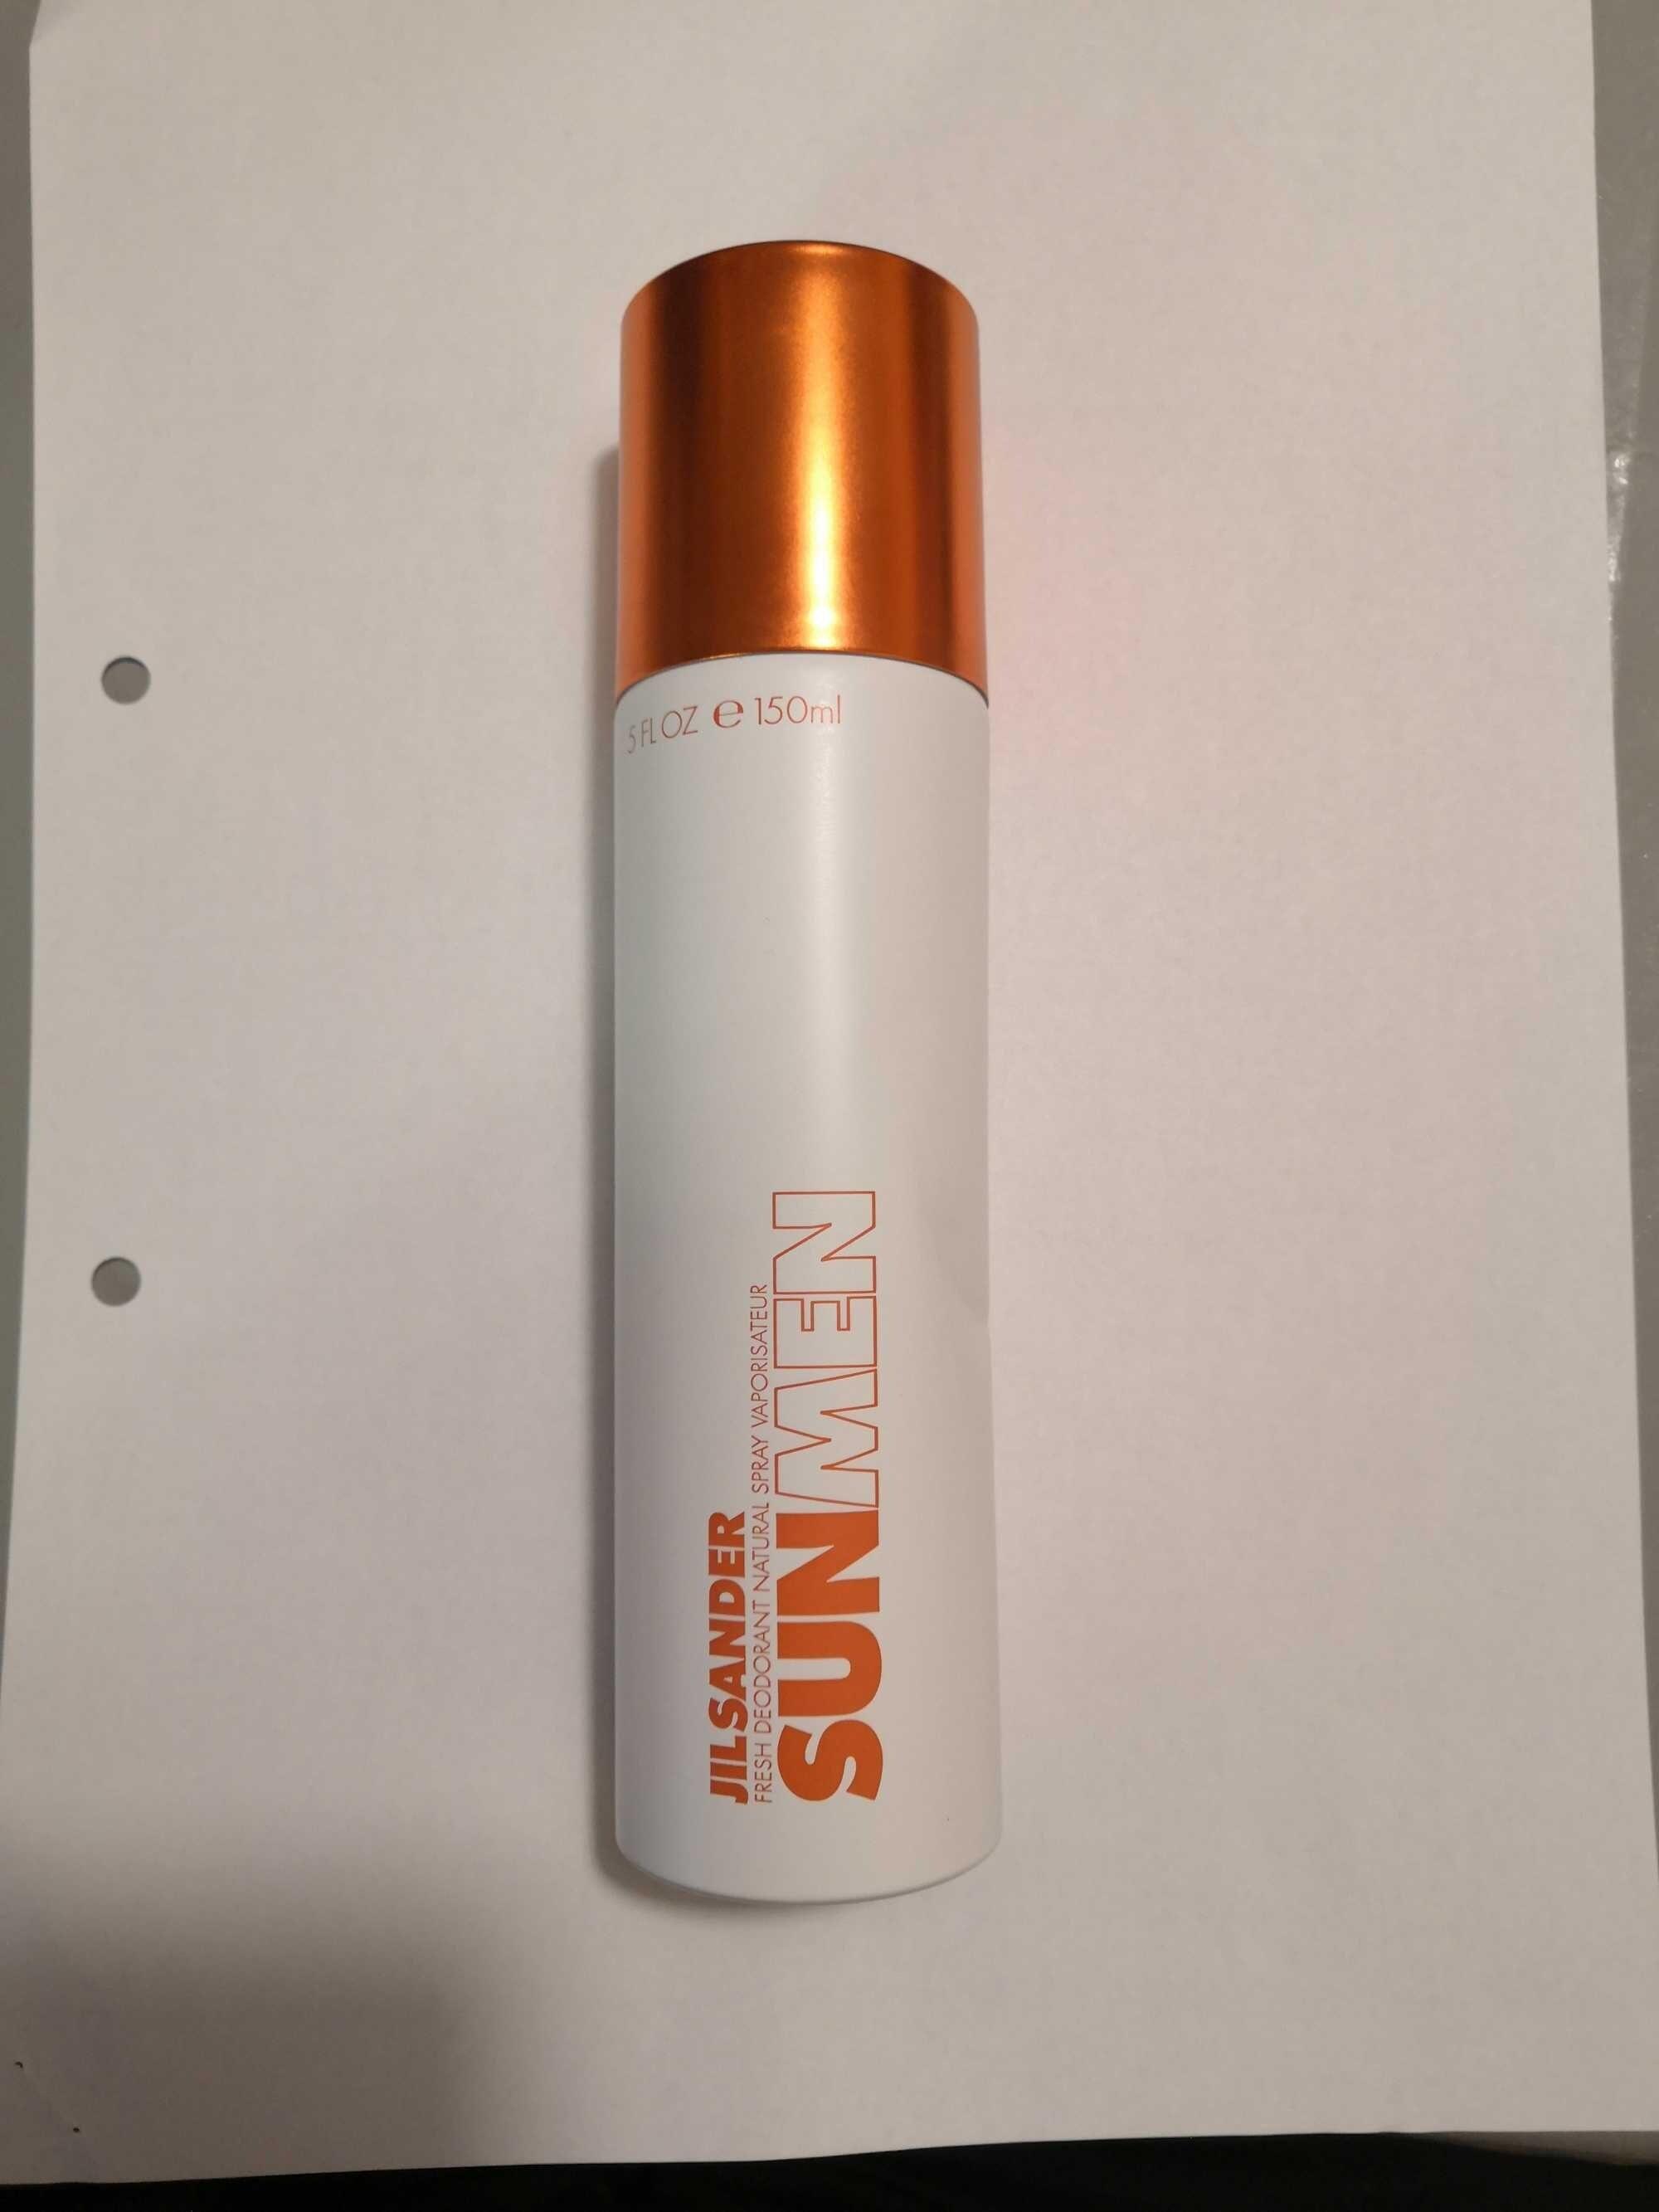 Jil Sander Sun Men - Product